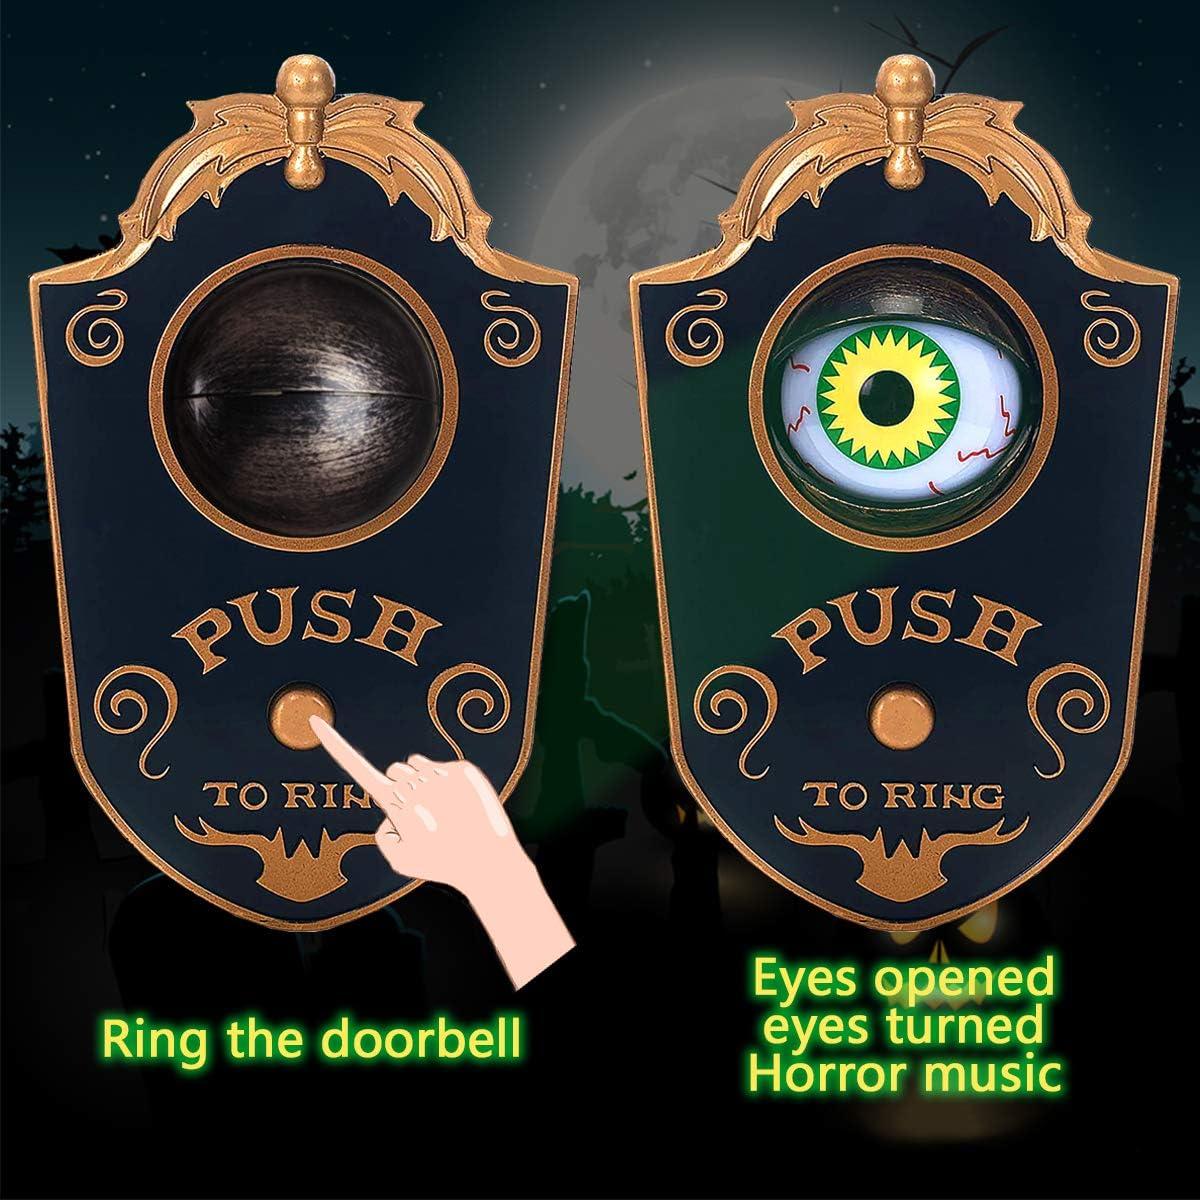 Haunted House Halloween Party Prop Decoration Haunted Doorbell Animated Eyeball Halloween Decor with Spooky Sounds Halloween Doorbell Trick or Treat Event for Kids Halloween Decoration